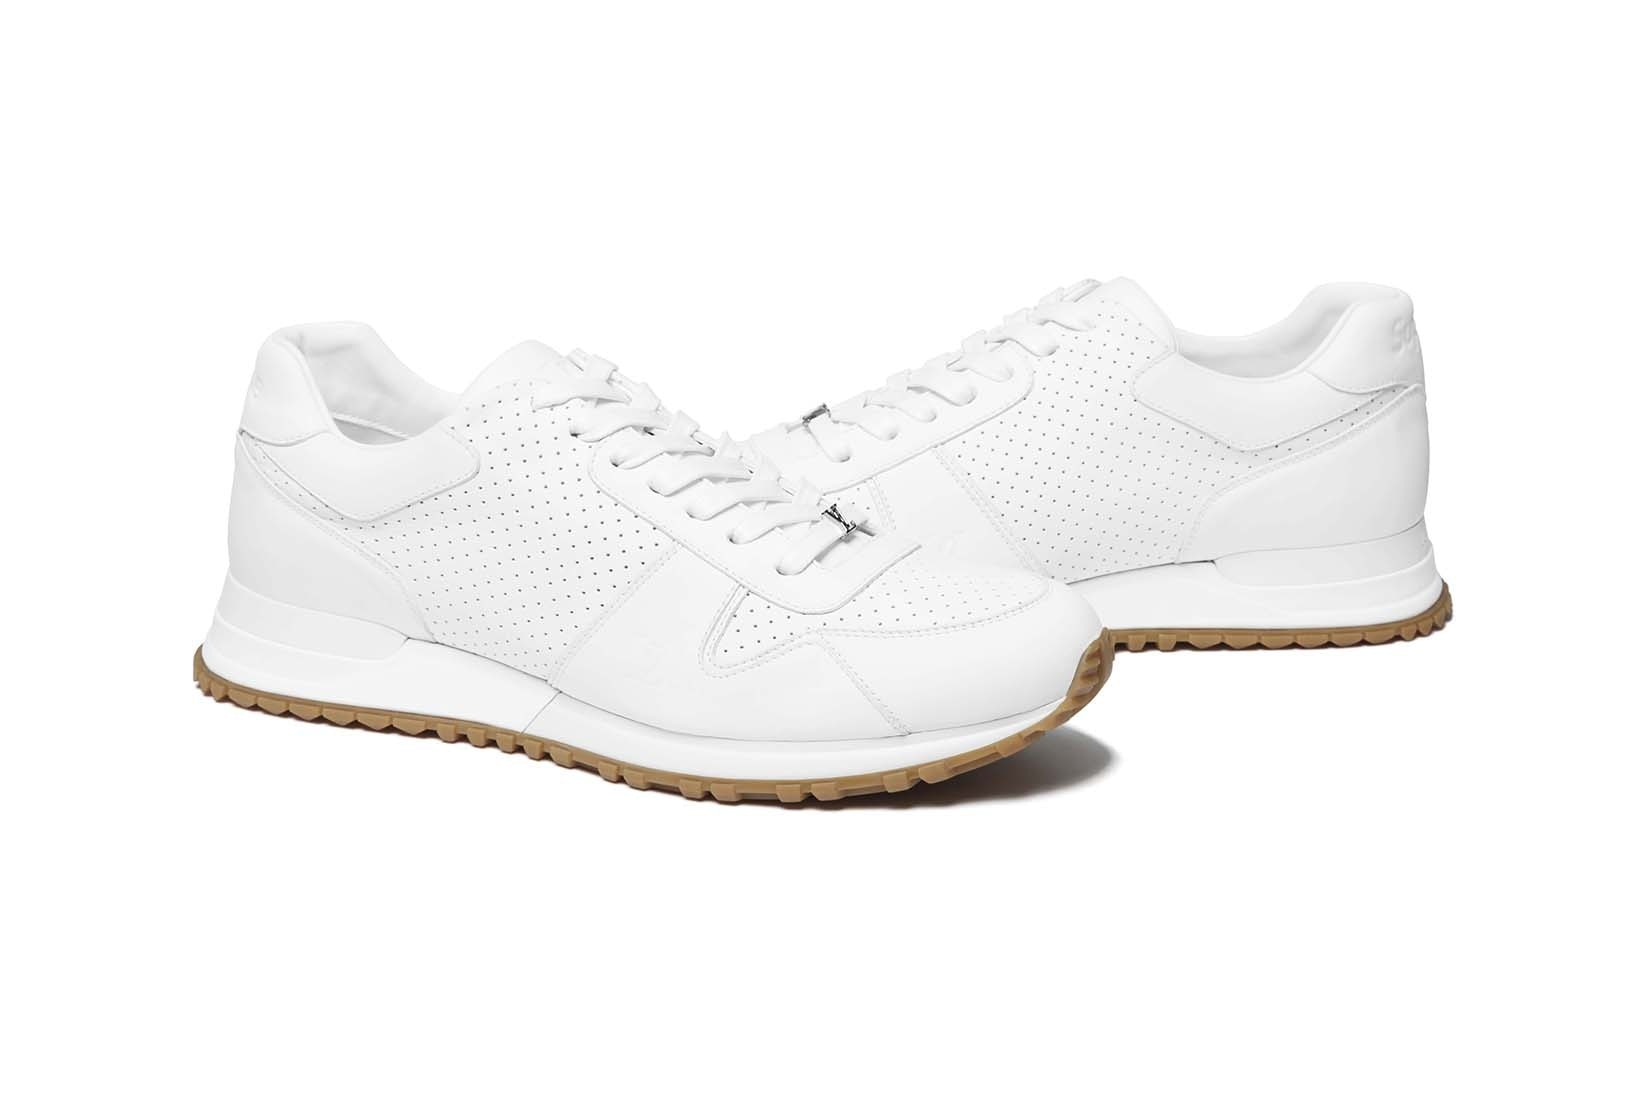 Supreme(シュプリーム)×Louis Vuitton(ルイ・ヴィトン) / ラン アウェイ スニーカー(Run Away Sneaker)